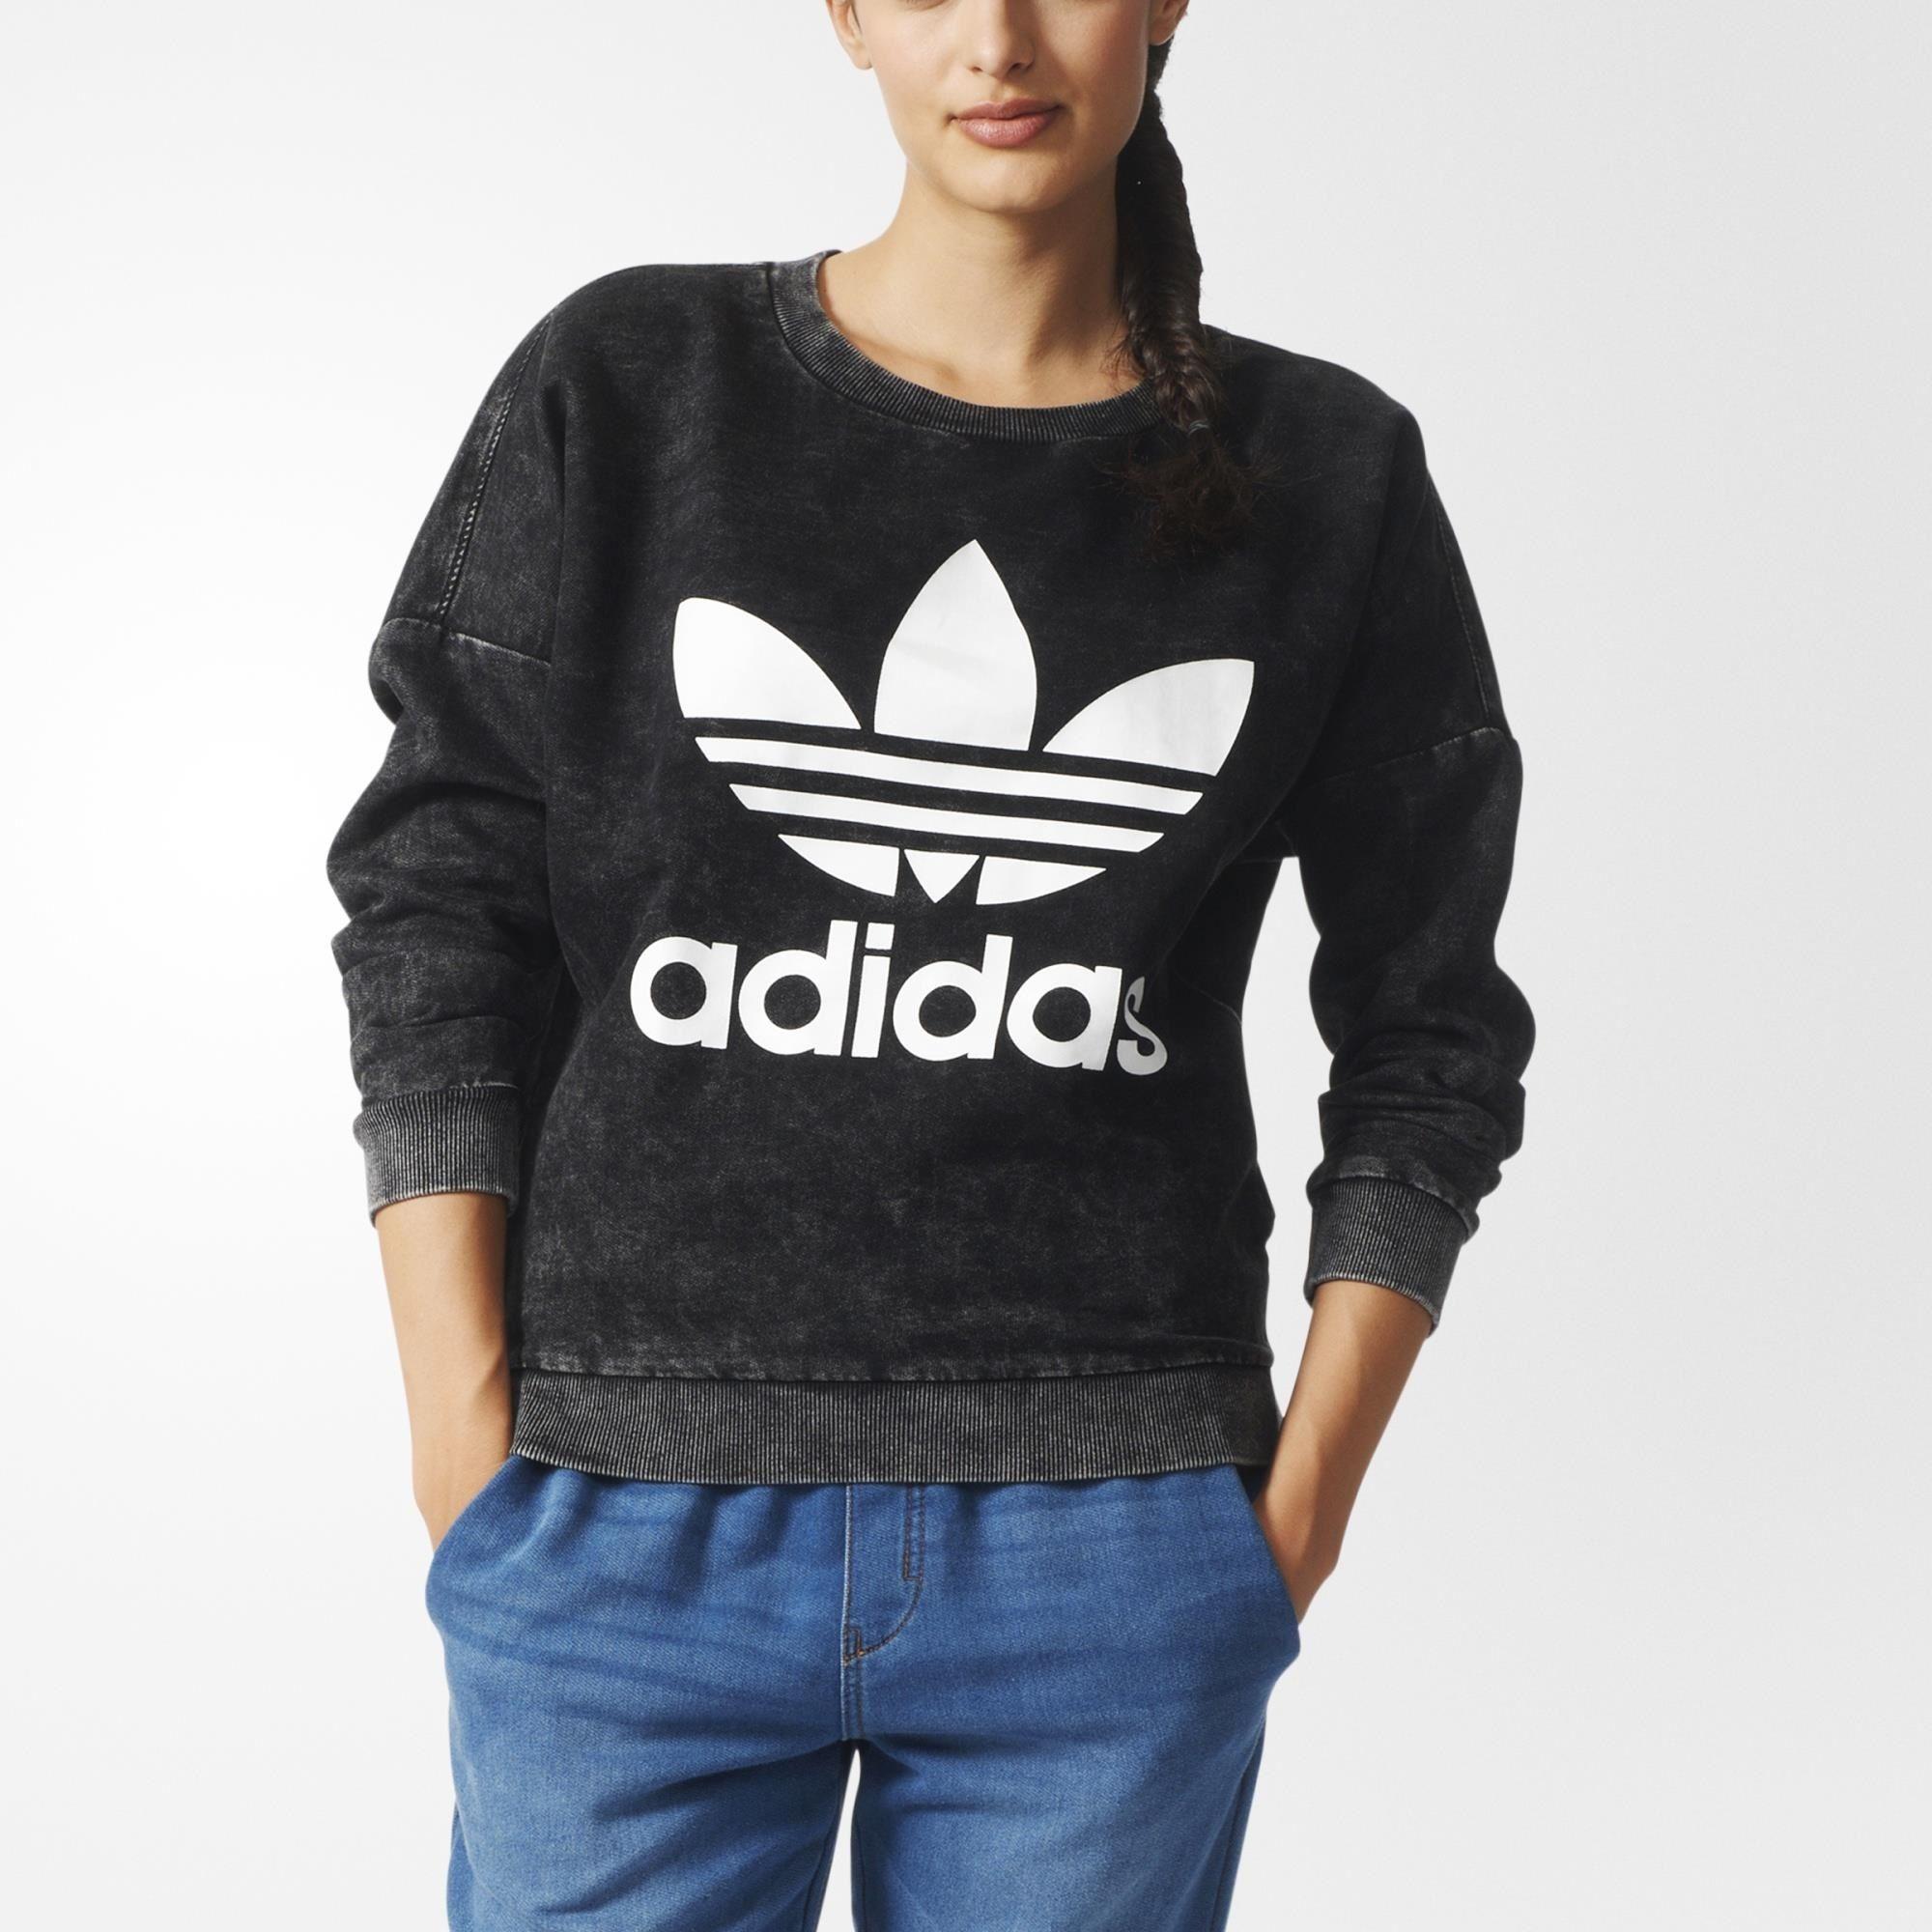 Adidas Denim Sweatshirt Multicolor Adidas Us Denim Sweatshirt Hoodies Womens Sweatshirts [ 2000 x 2000 Pixel ]